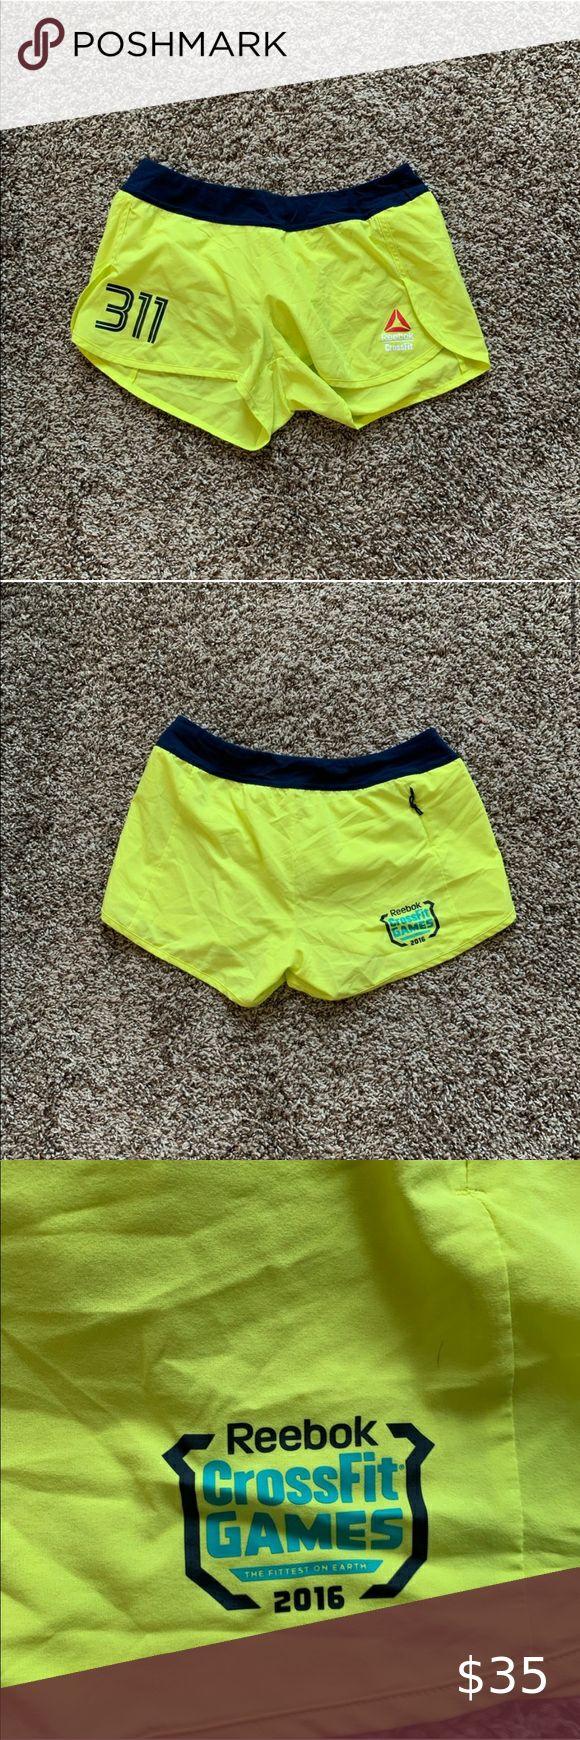 2016 Reebok crossfit games shorts in 2020 Reebok